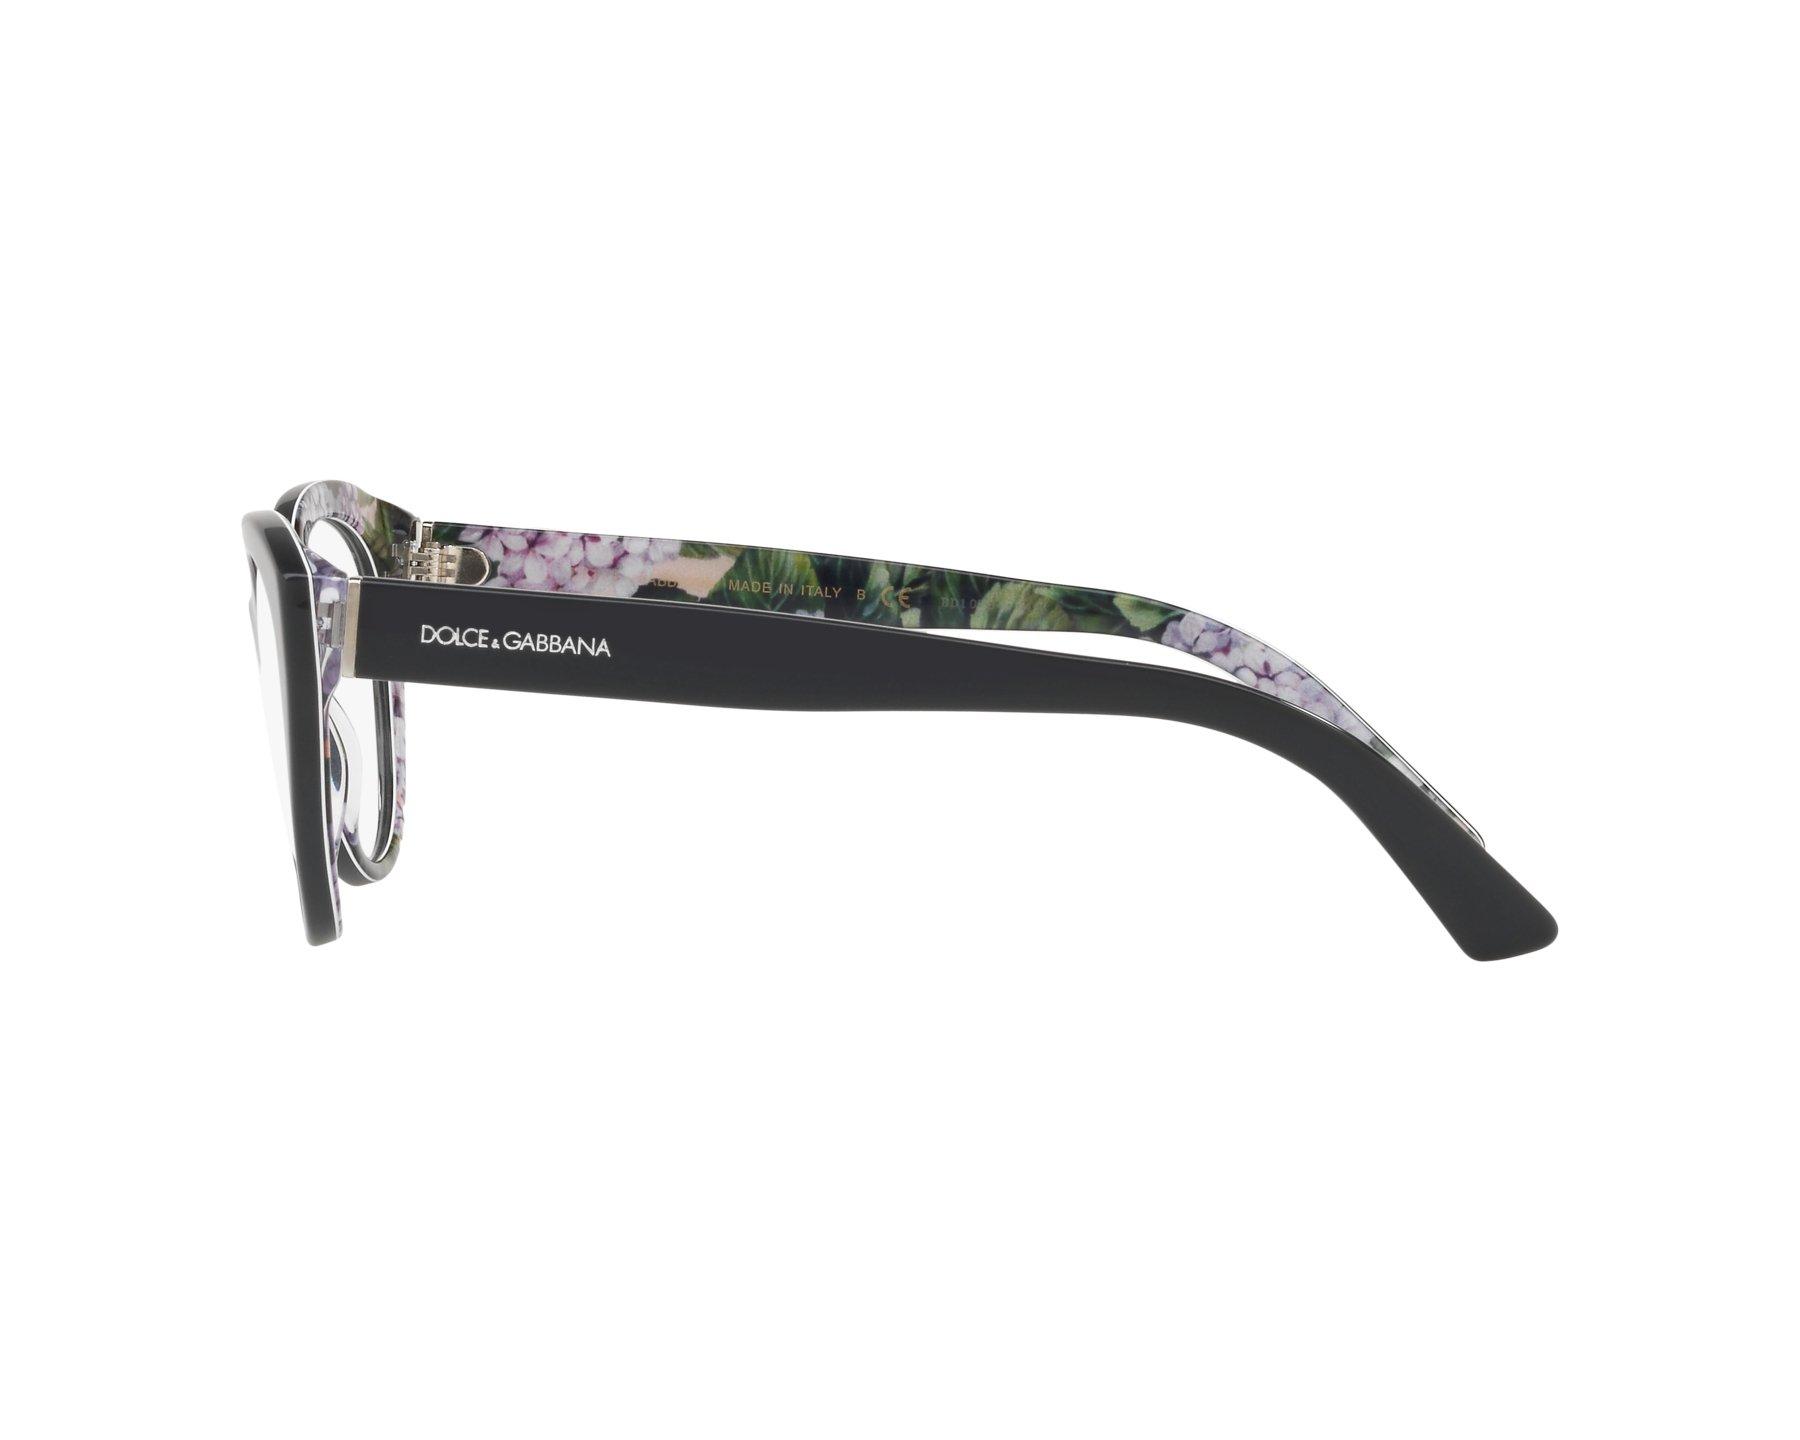 7ad0348cec Dolce   Gabbana Eyeglasses DG-3246 3161 Grey